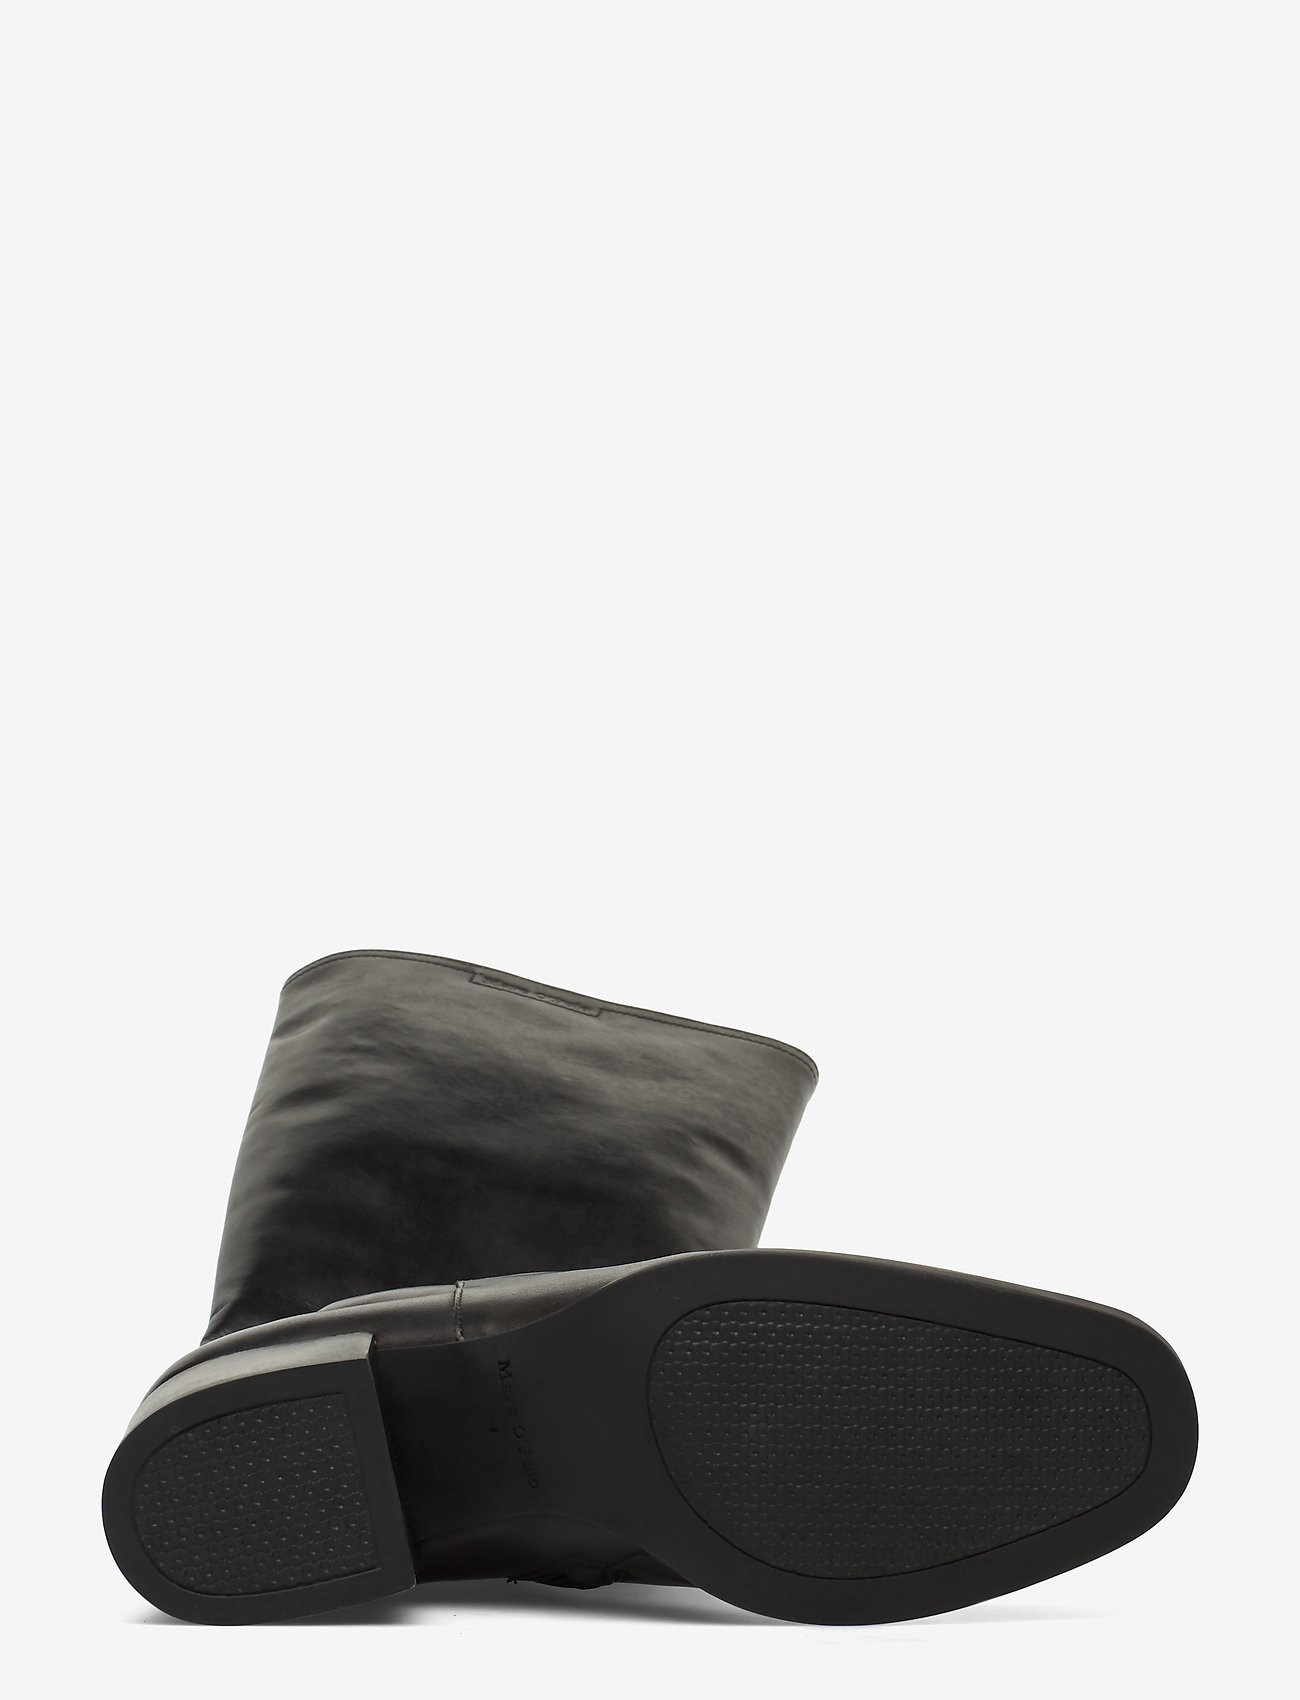 Catania 9b (Black) - Marc O'Polo Footwear